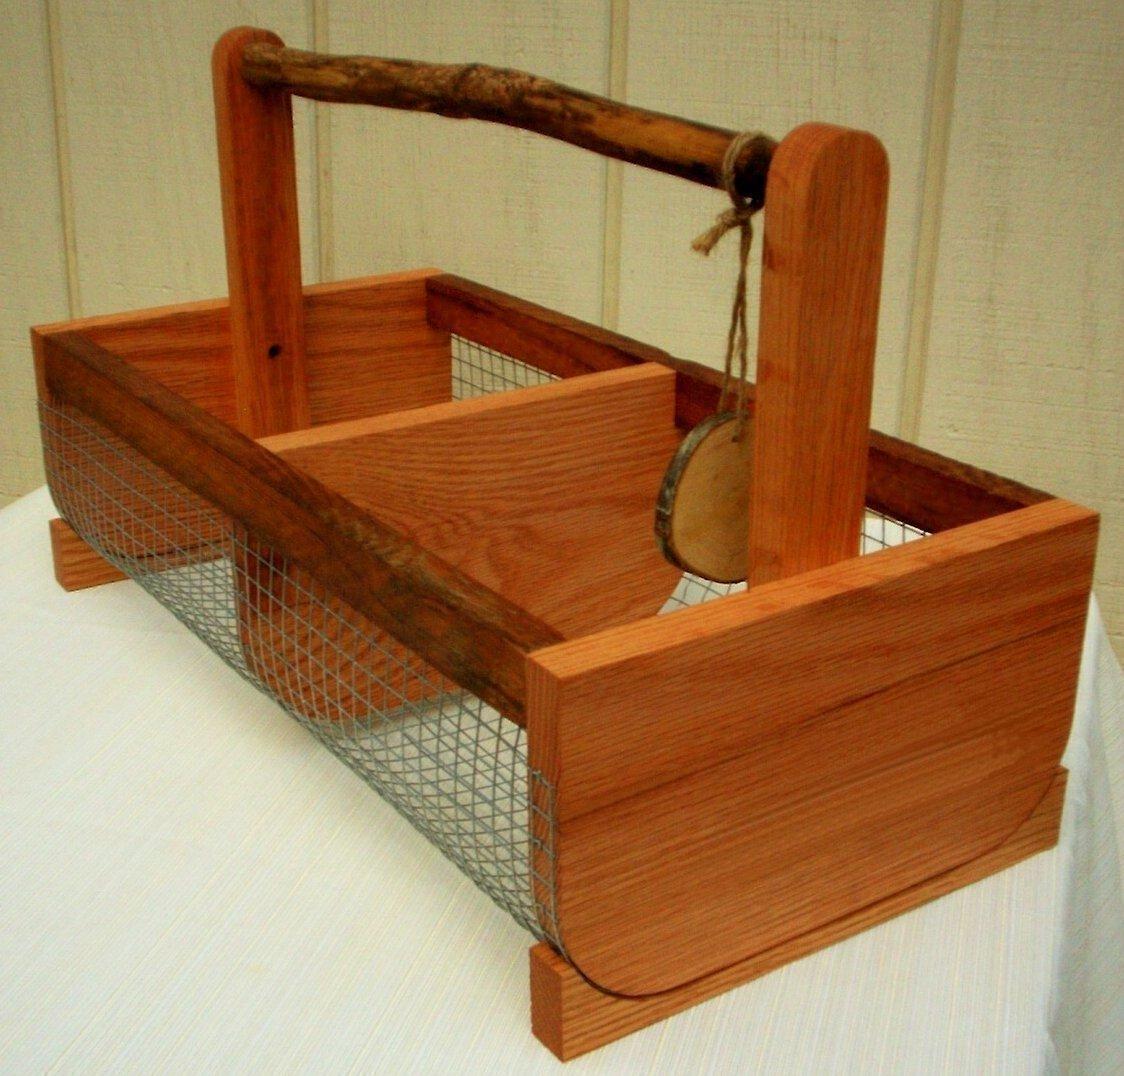 Food Storage,Harvest Basket,Garden Basket,Storage Bin,Farmhouse Decor,Picnic Basket, Large